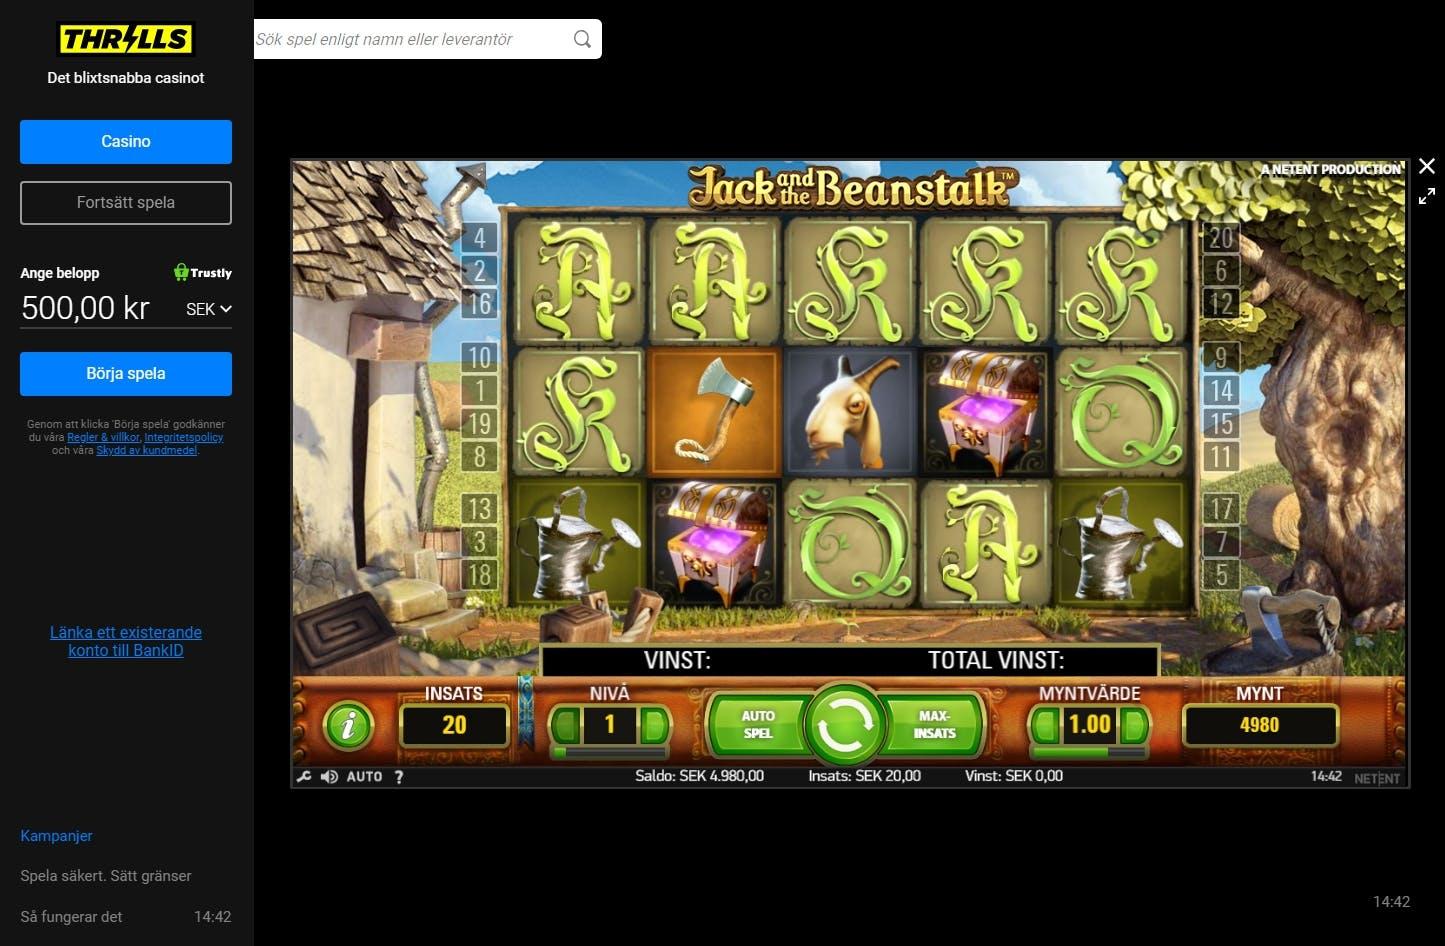 Casino provspela slot som 143842